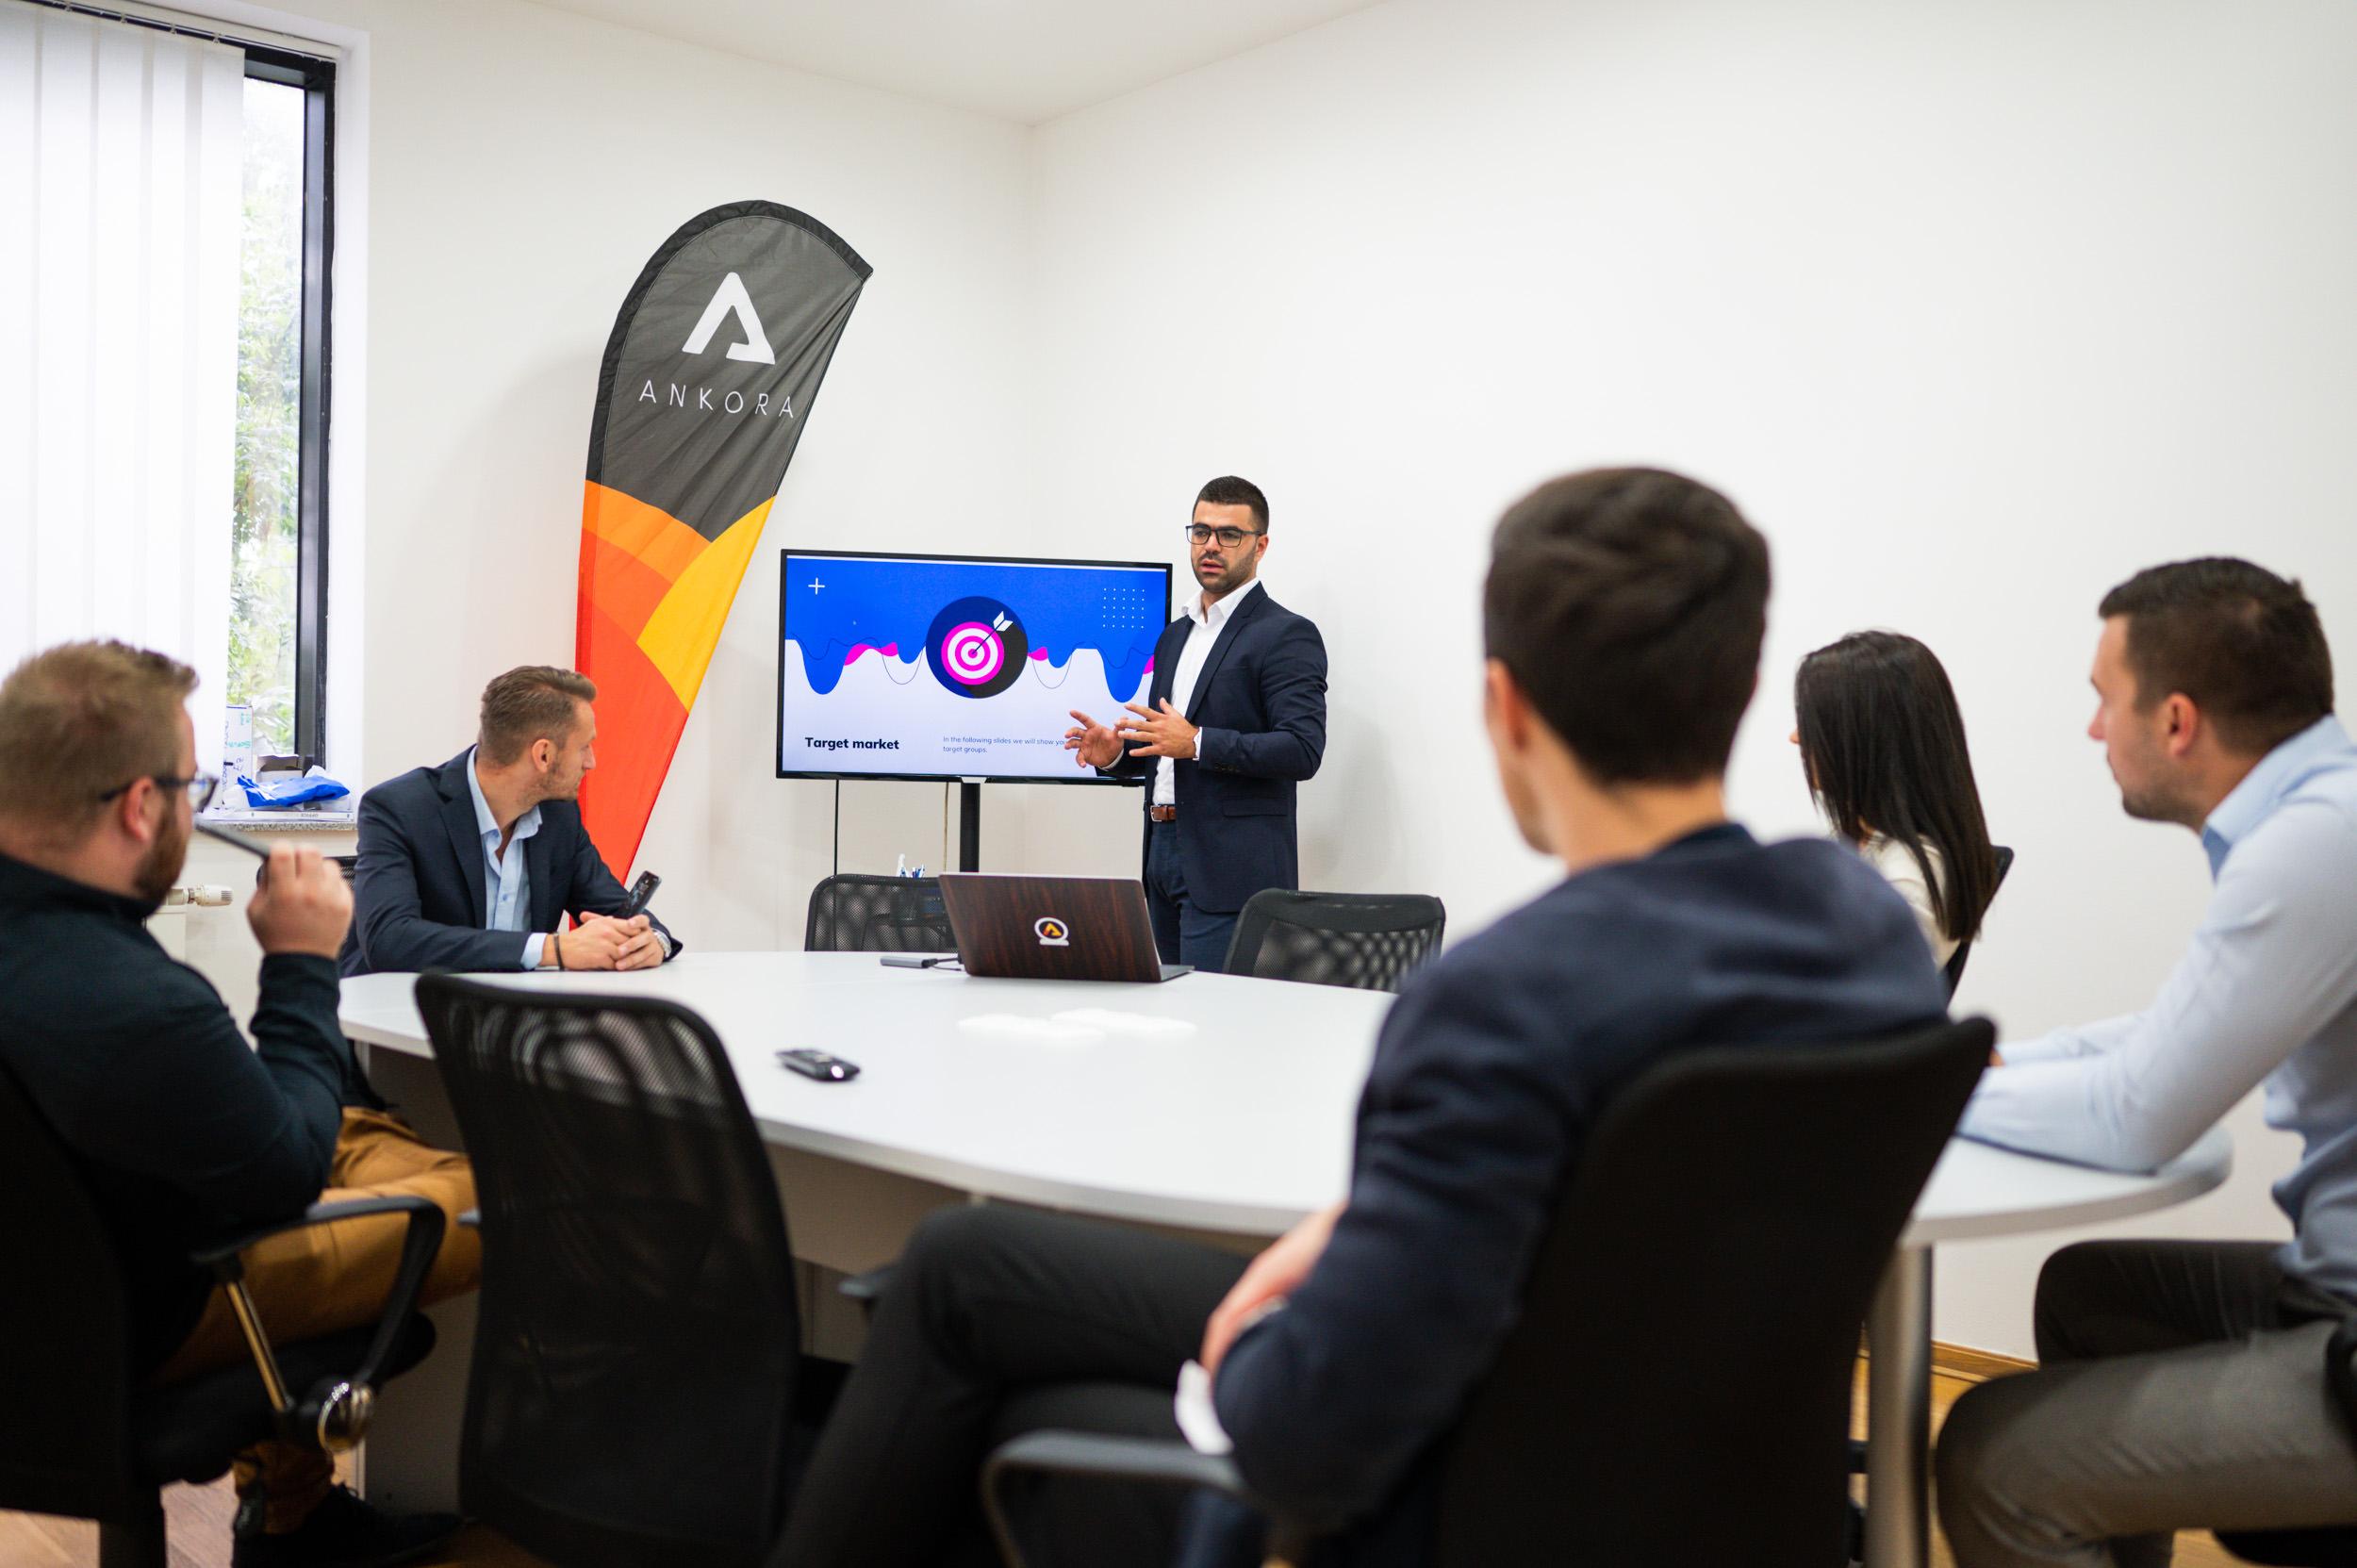 Ankora Software